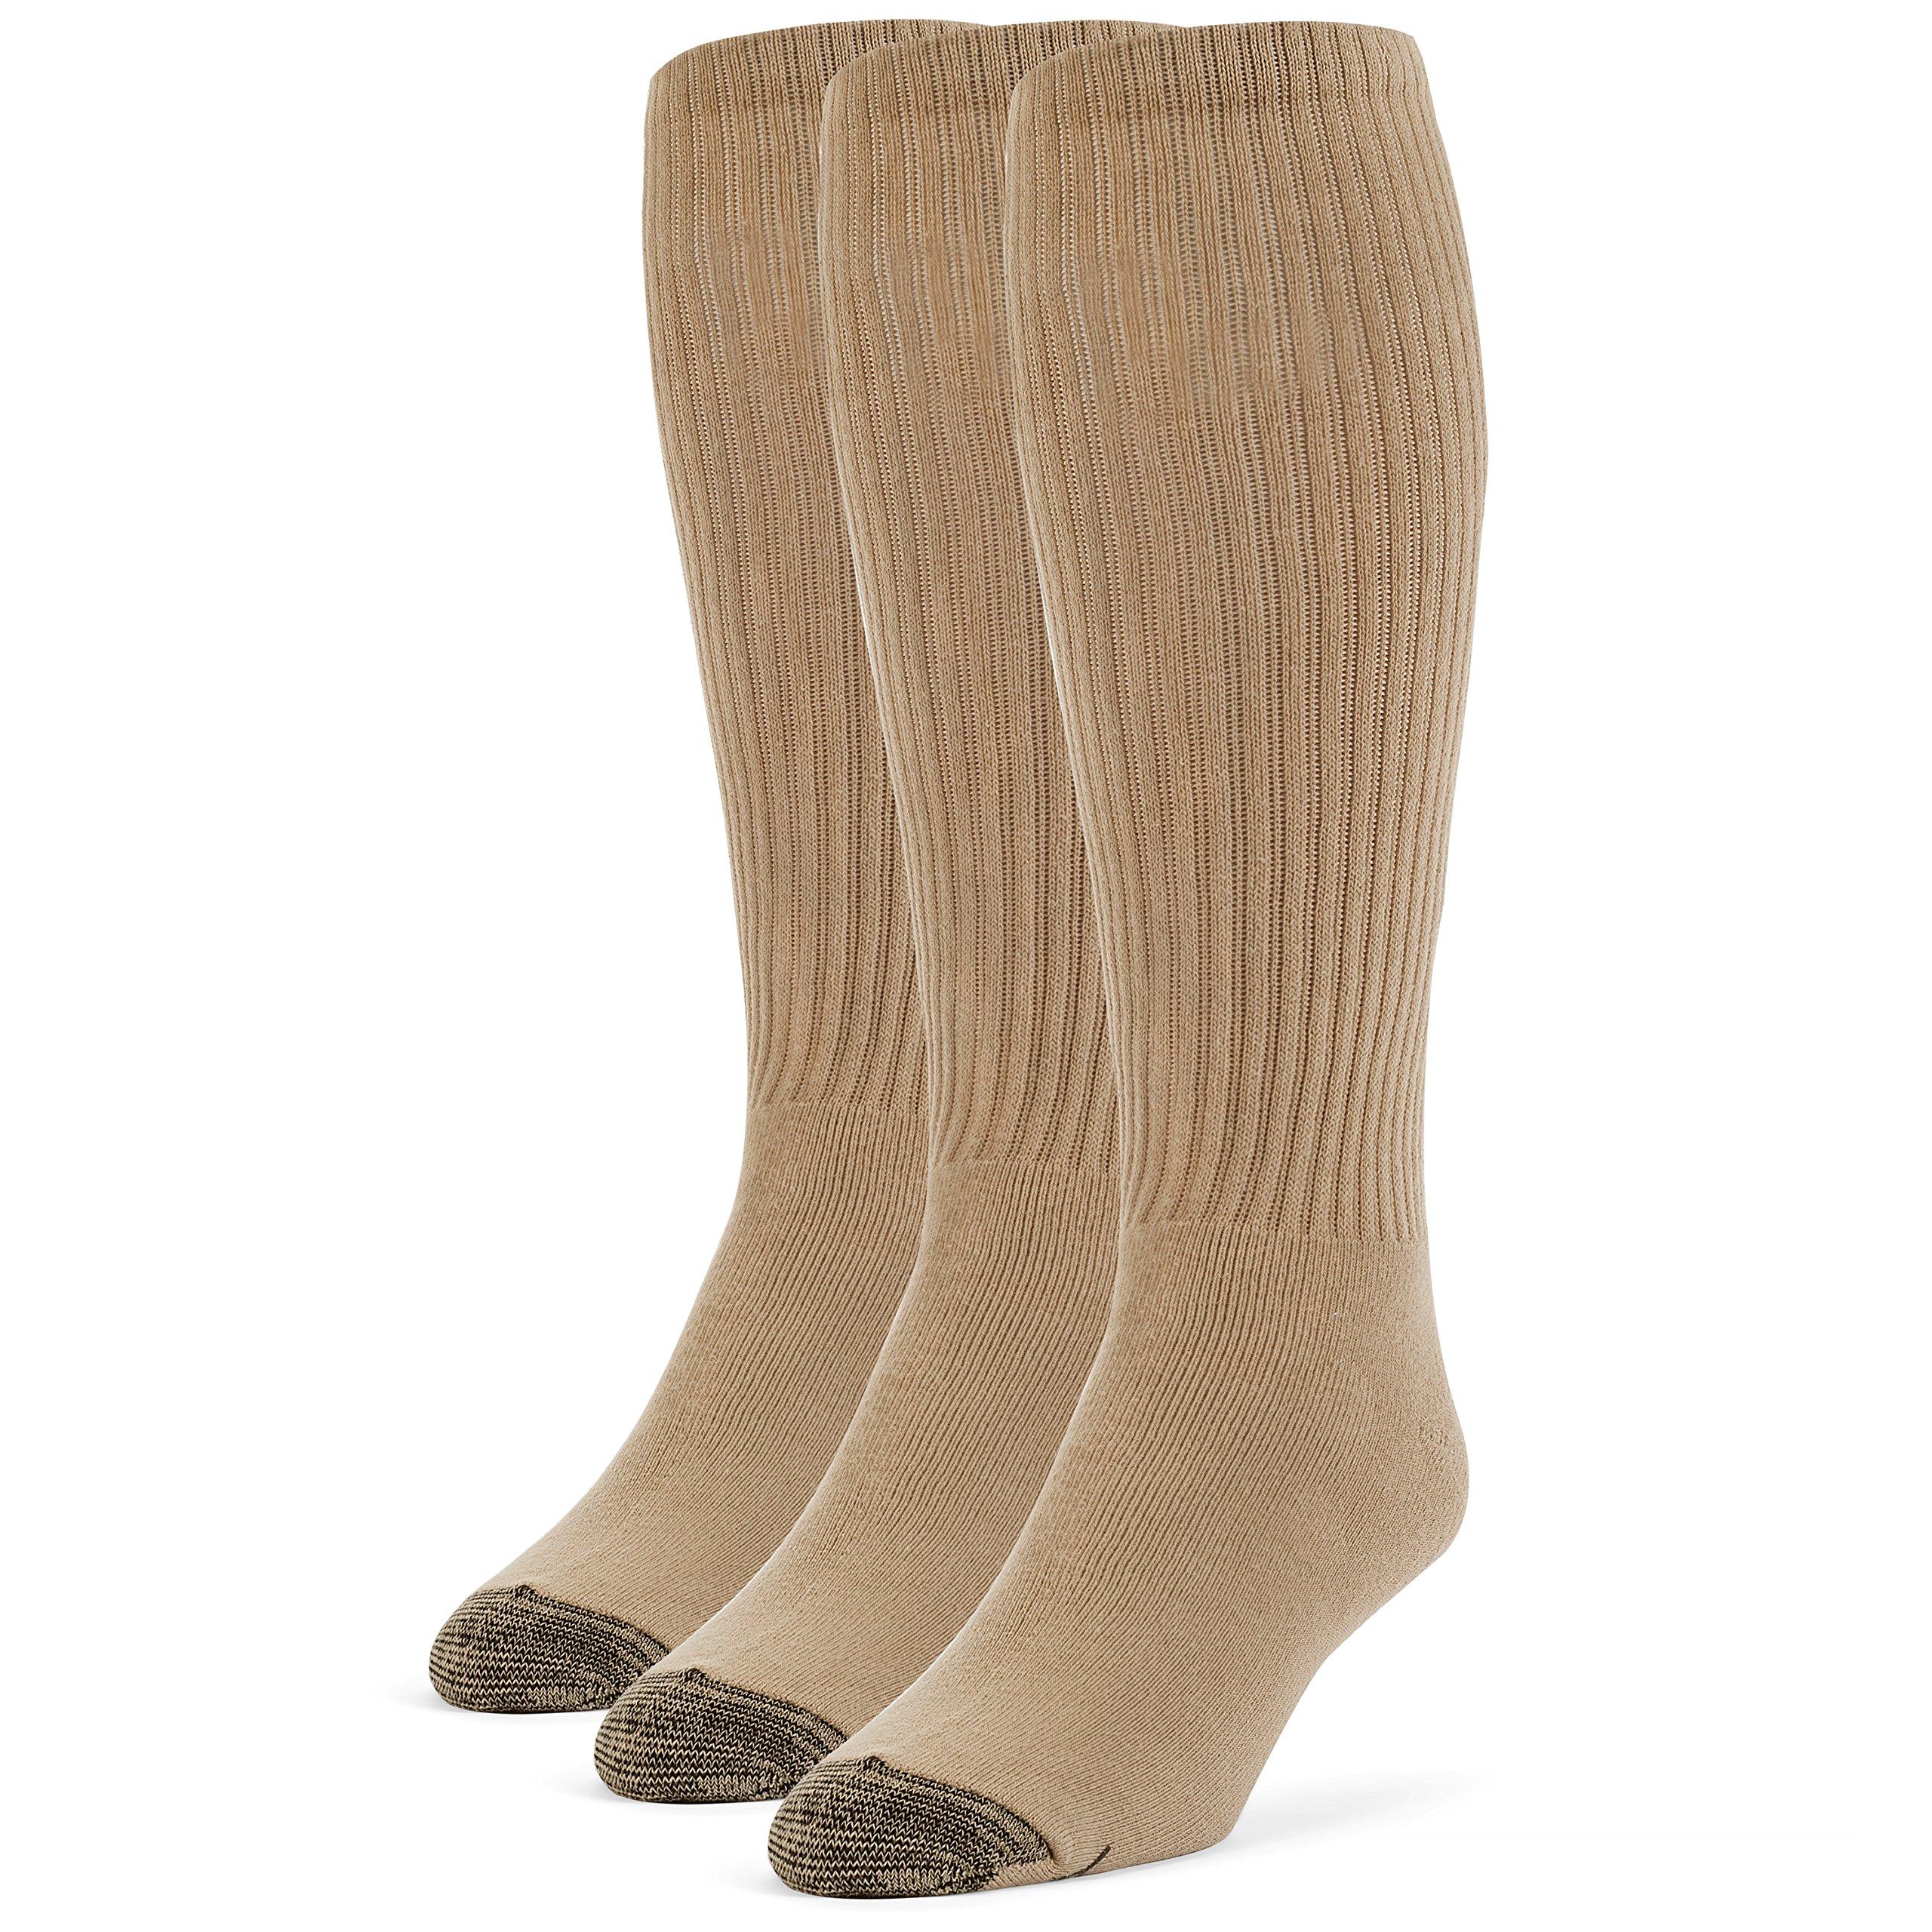 Galiva Men's Cotton Extra Soft Over the Calf Cushion Socks - 3 Pairs, Medium, Nude Beige